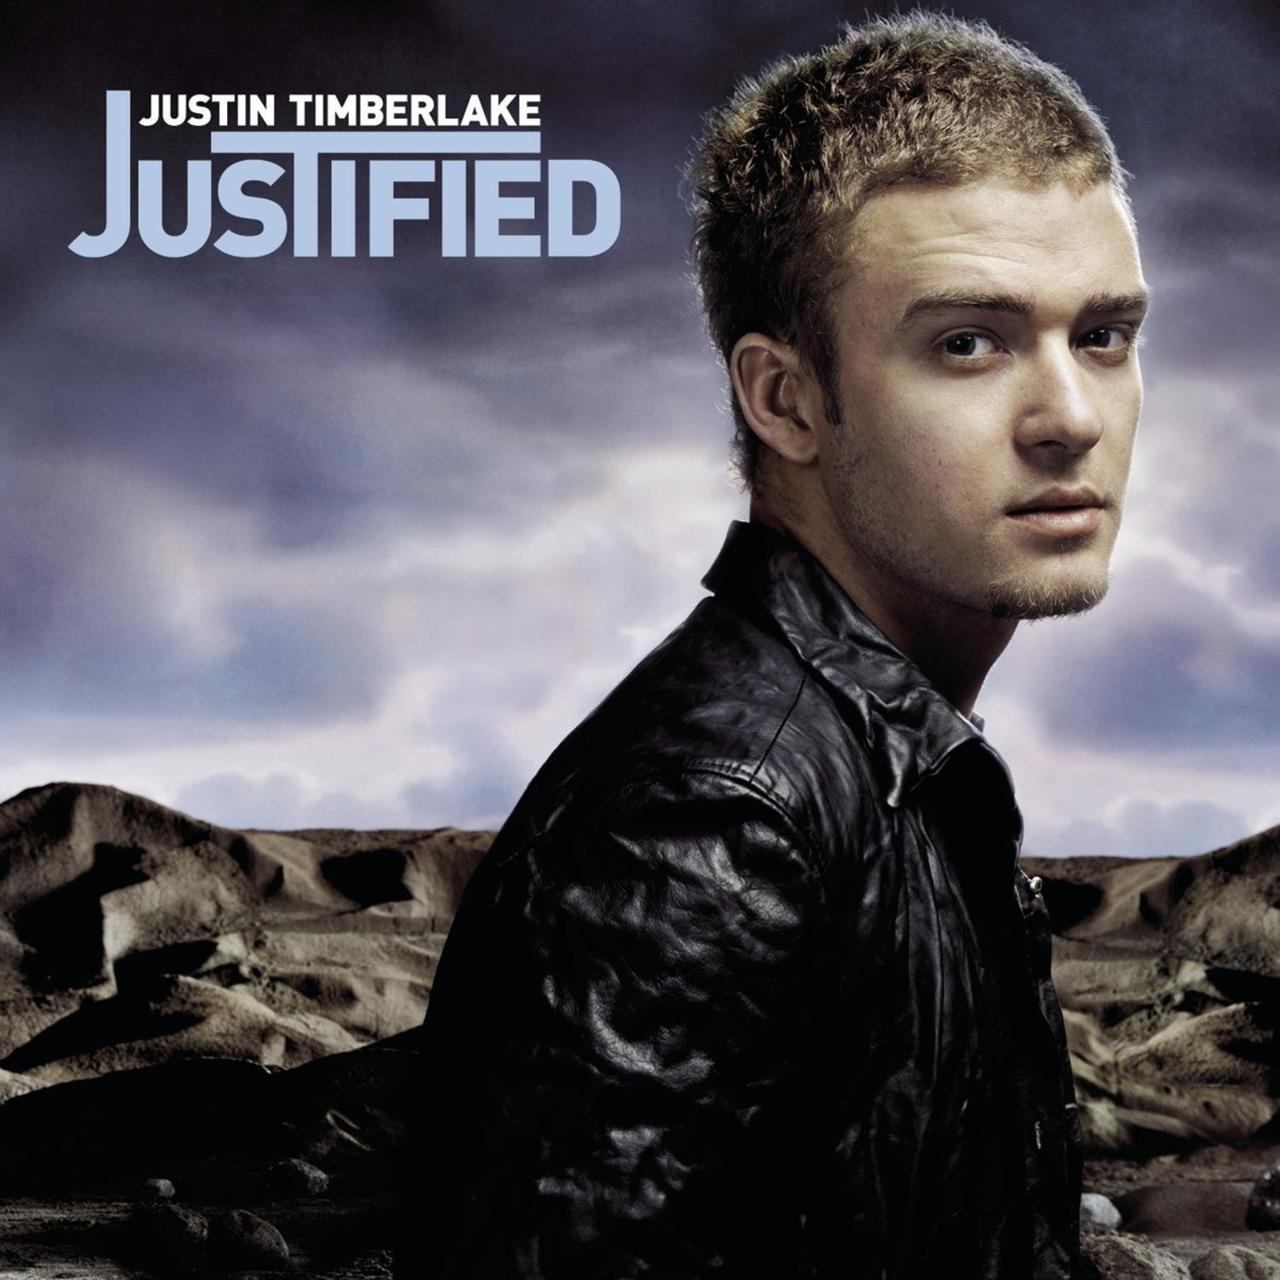 СD-диск. Justin Timberlake - Justified